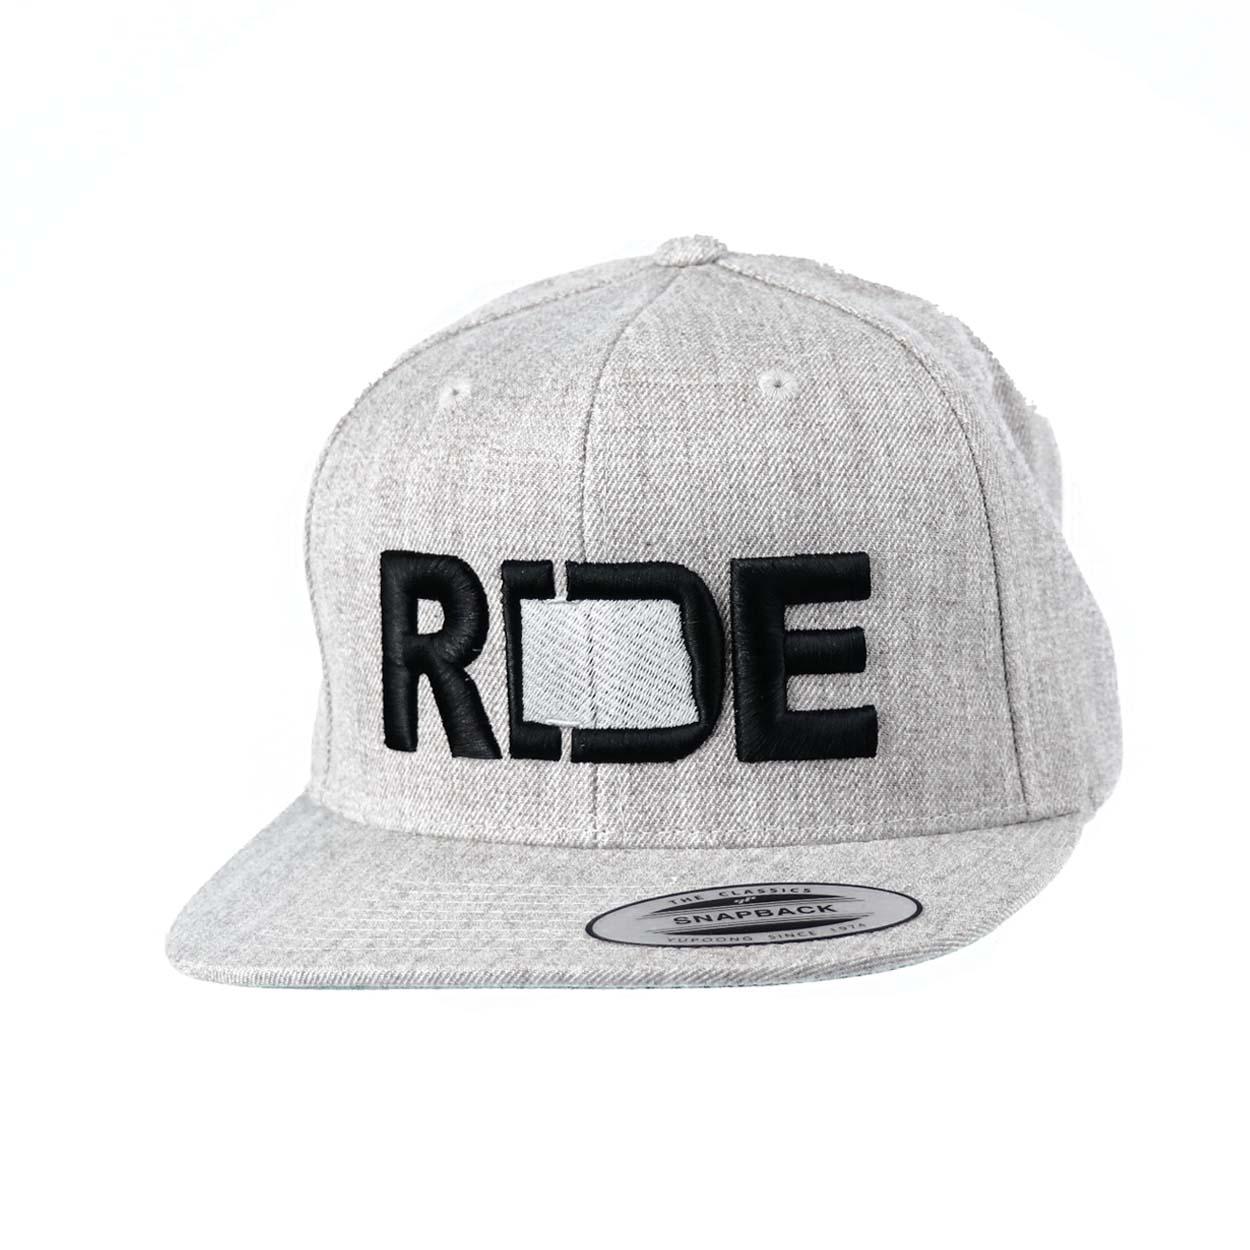 Ride North Dakota Classic Embroidered  Snapback Flat Brim Hat Gray/Black